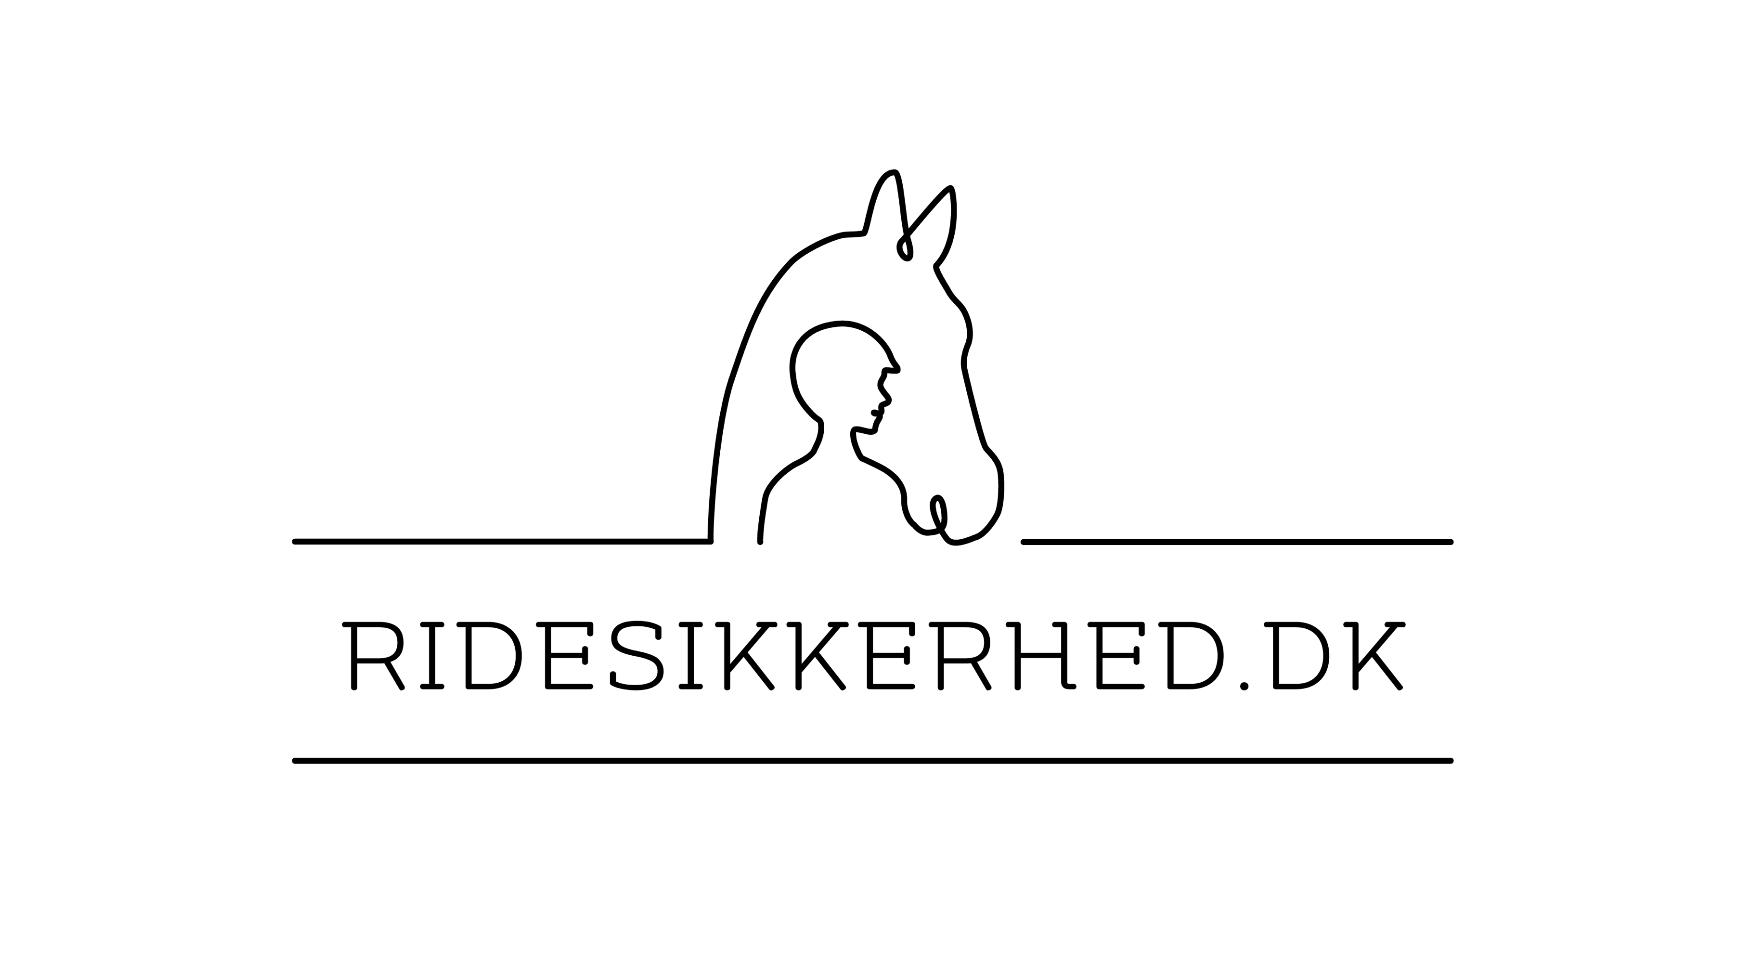 Ridesikkerhed.dk logodesign